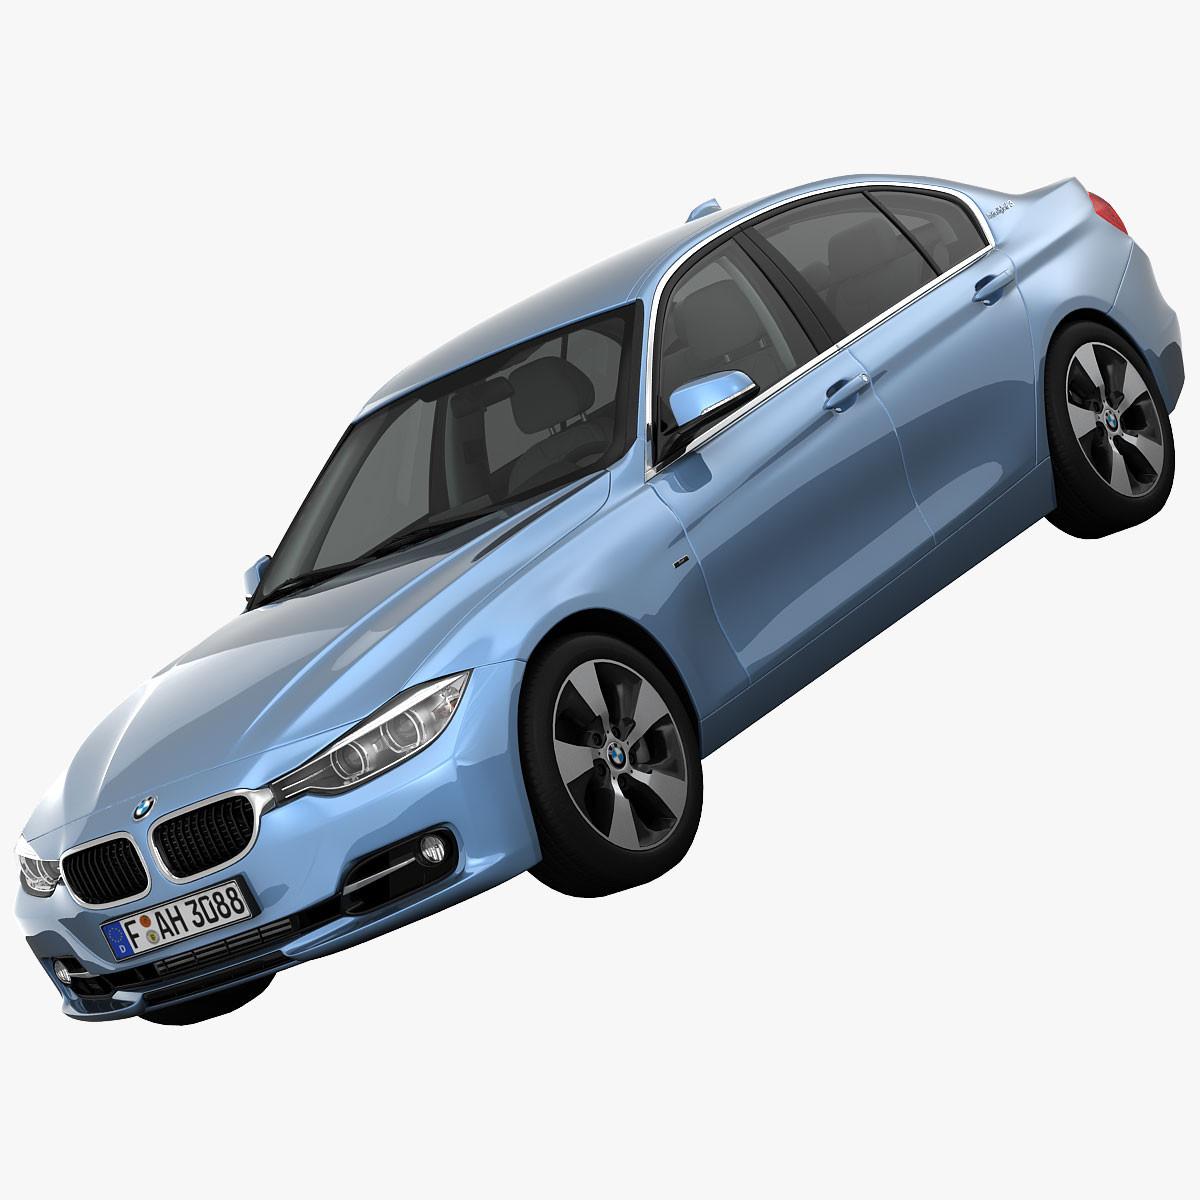 BMW-F30-ActiveHybrid-0.jpg